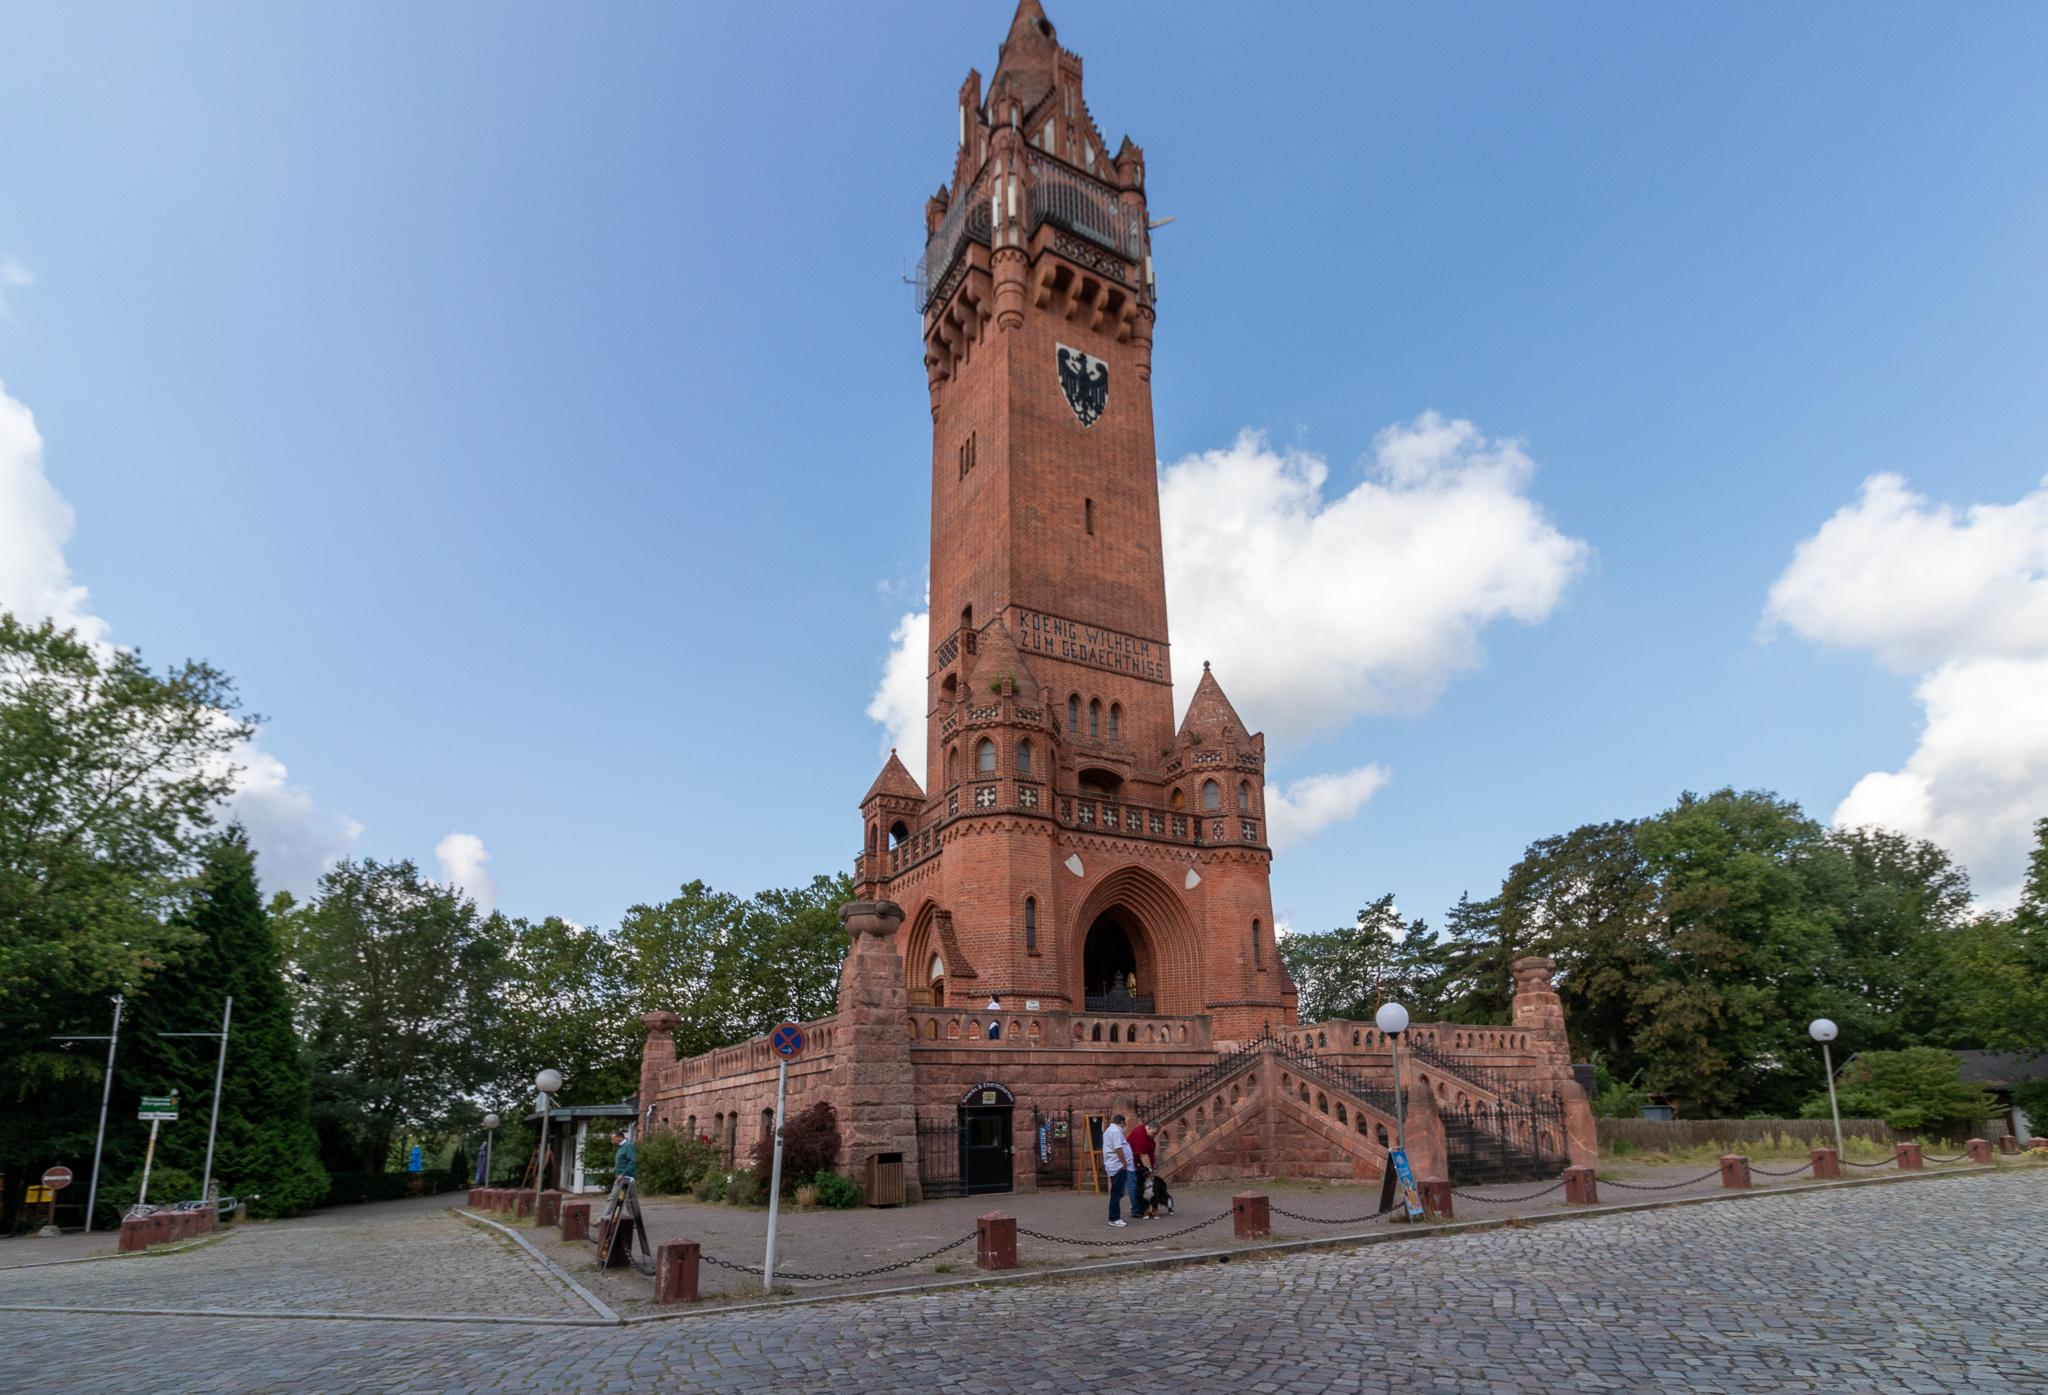 König Wilhelm Monument